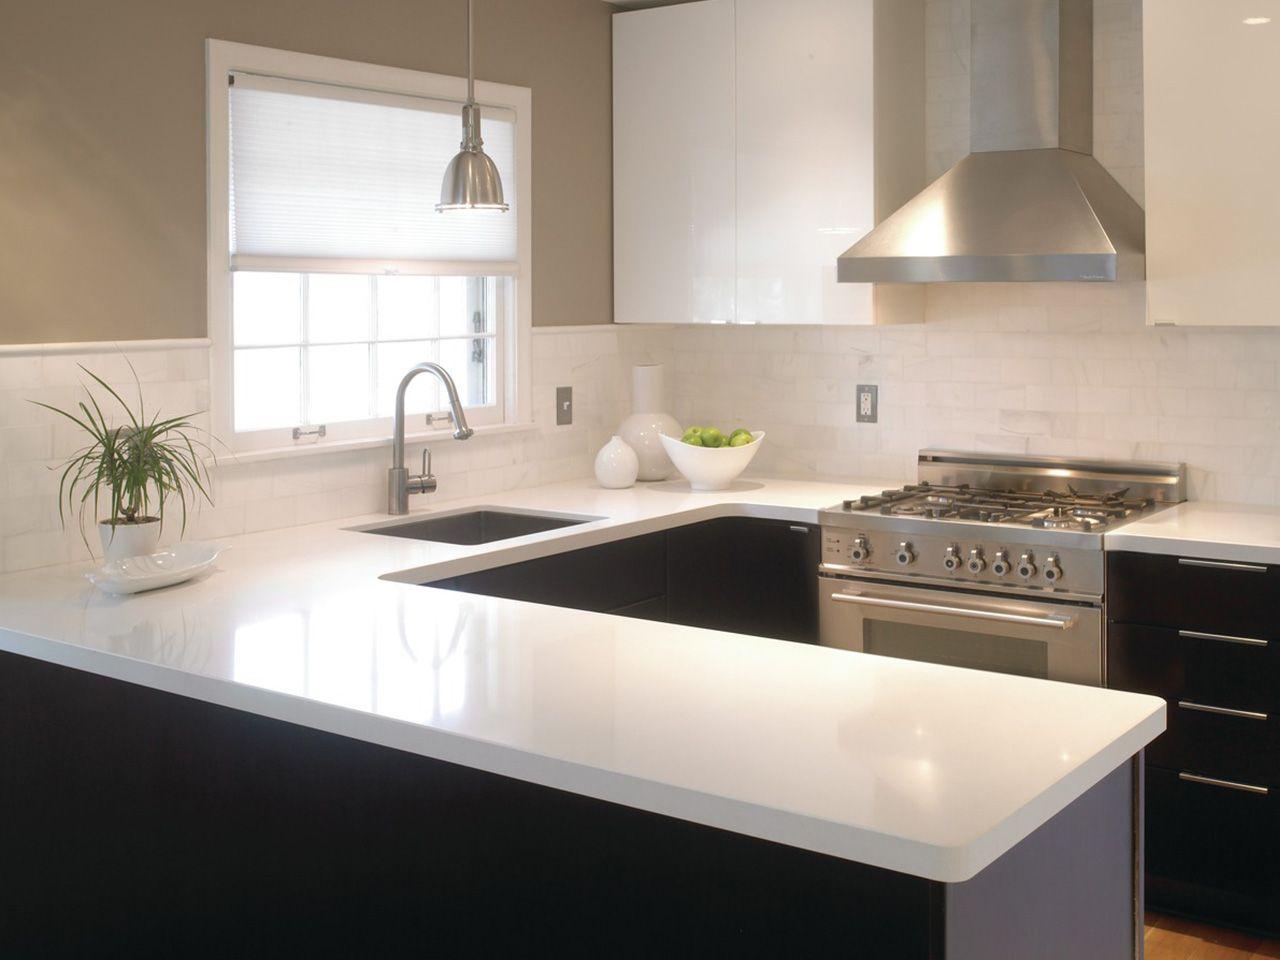 stone kitchen countertops. Inspiration Gallery   Cambria Quartz Stone Surfaces Kitchen Countertops E